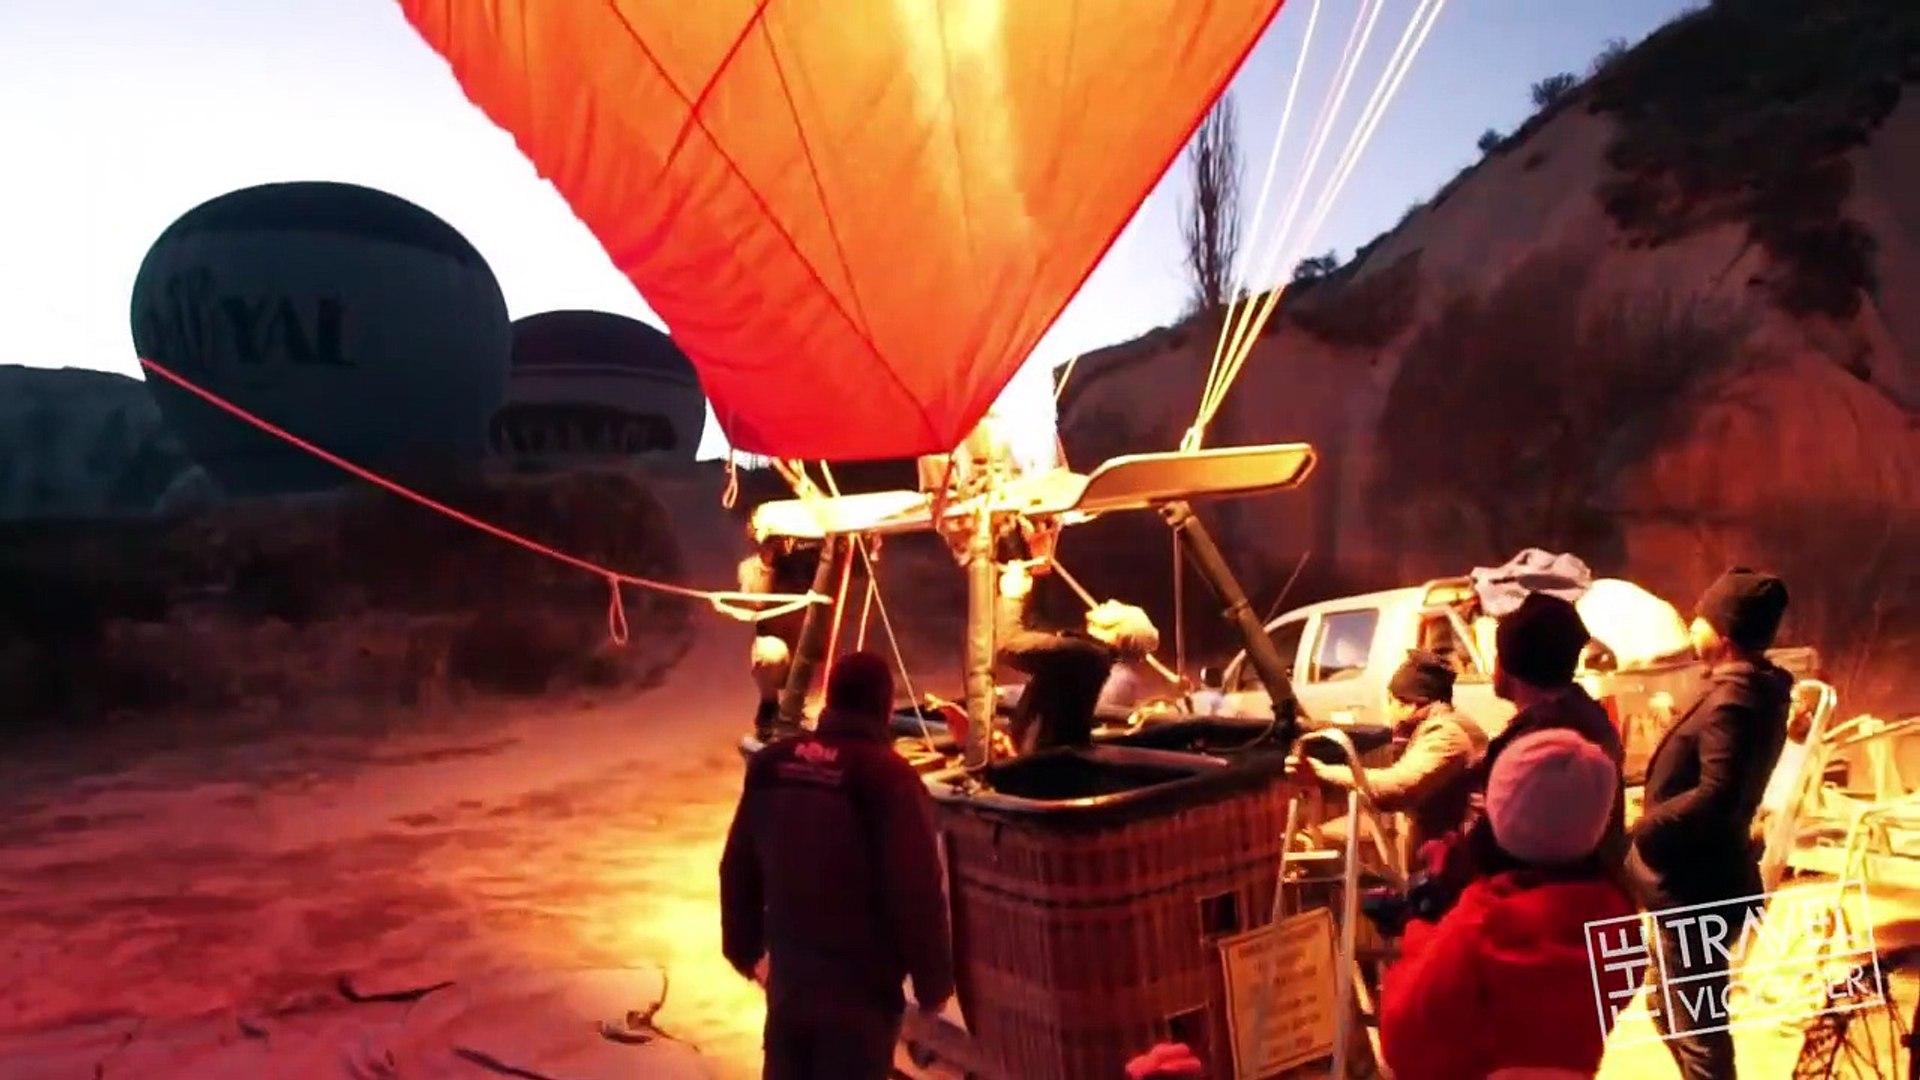 Cappadocia Top 5 Things to do - Travel